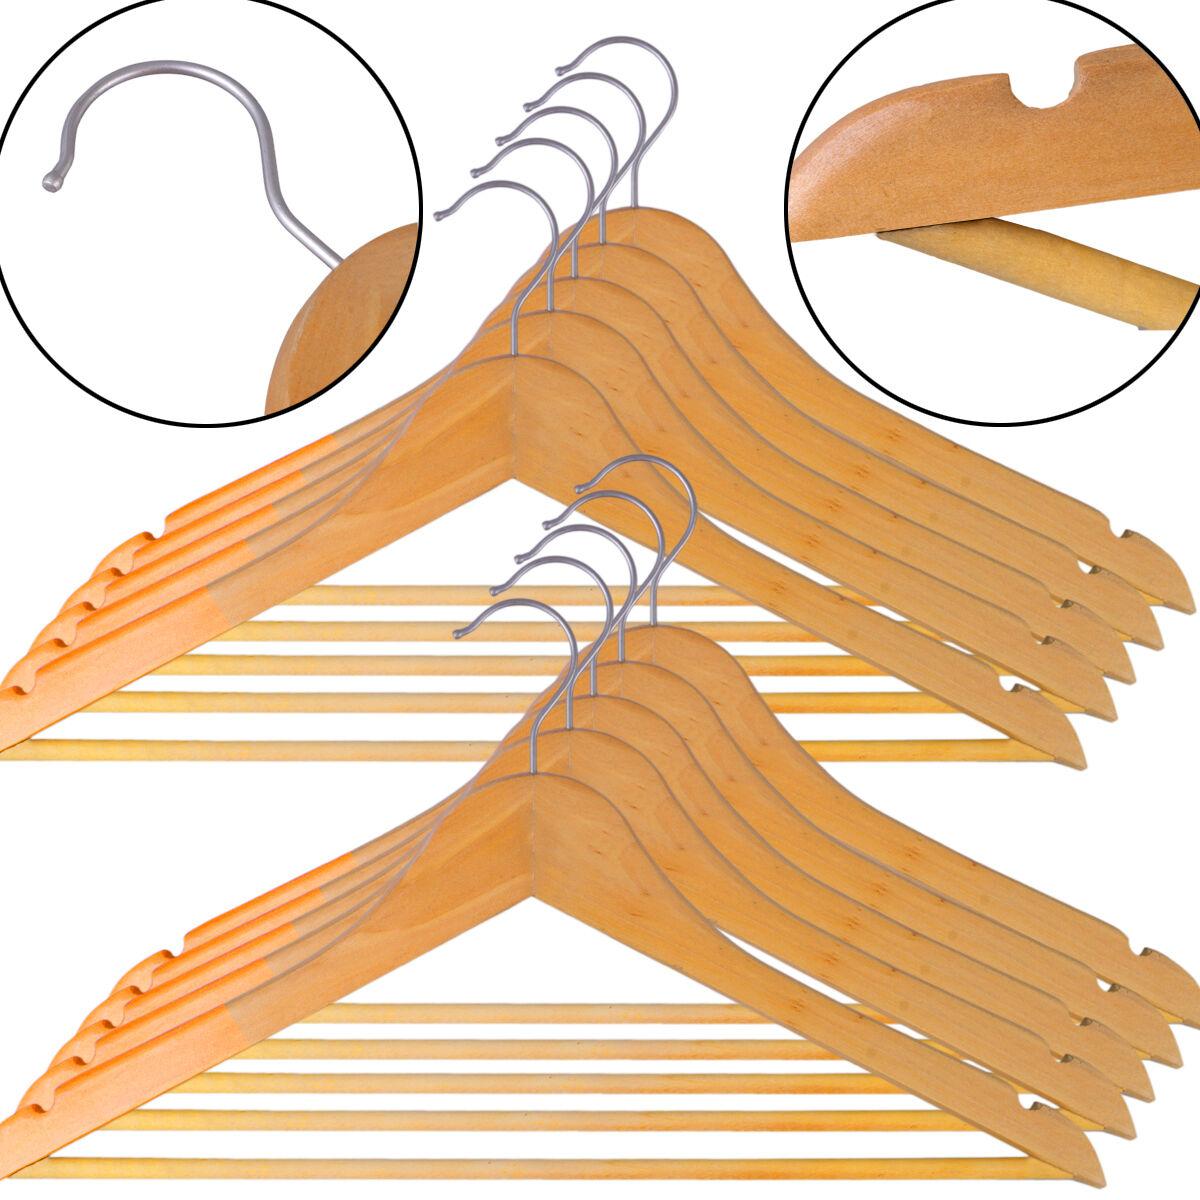 Holzbügel Kleiderbügel Holz Garderobenbügel Holzkleiderbügel-Set mit Hosenstange